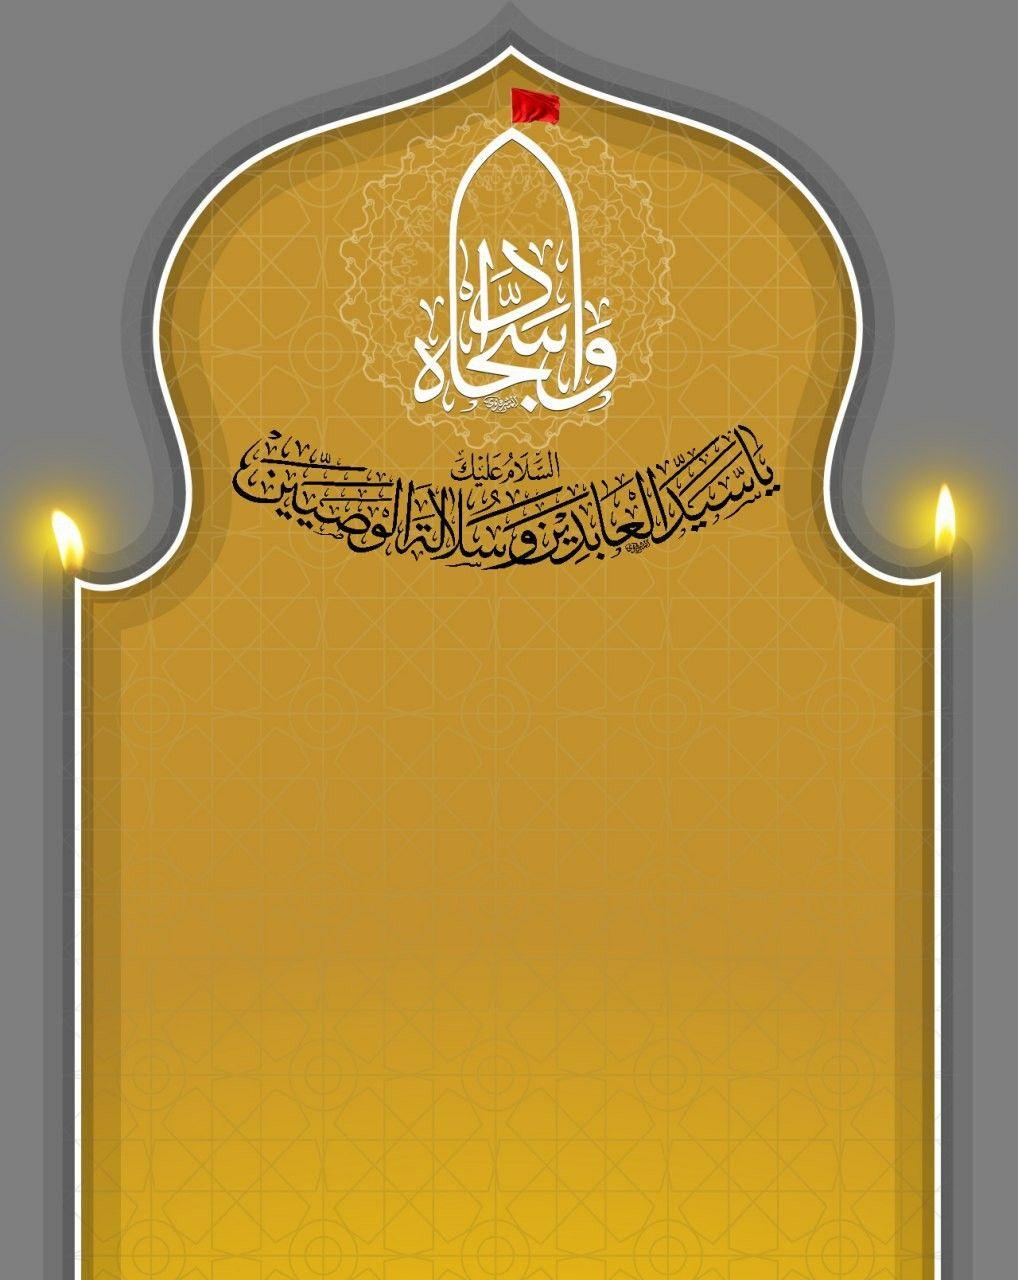 Pin By هدوء أحمد On خلفيات حسينية In 2021 Banner Boards